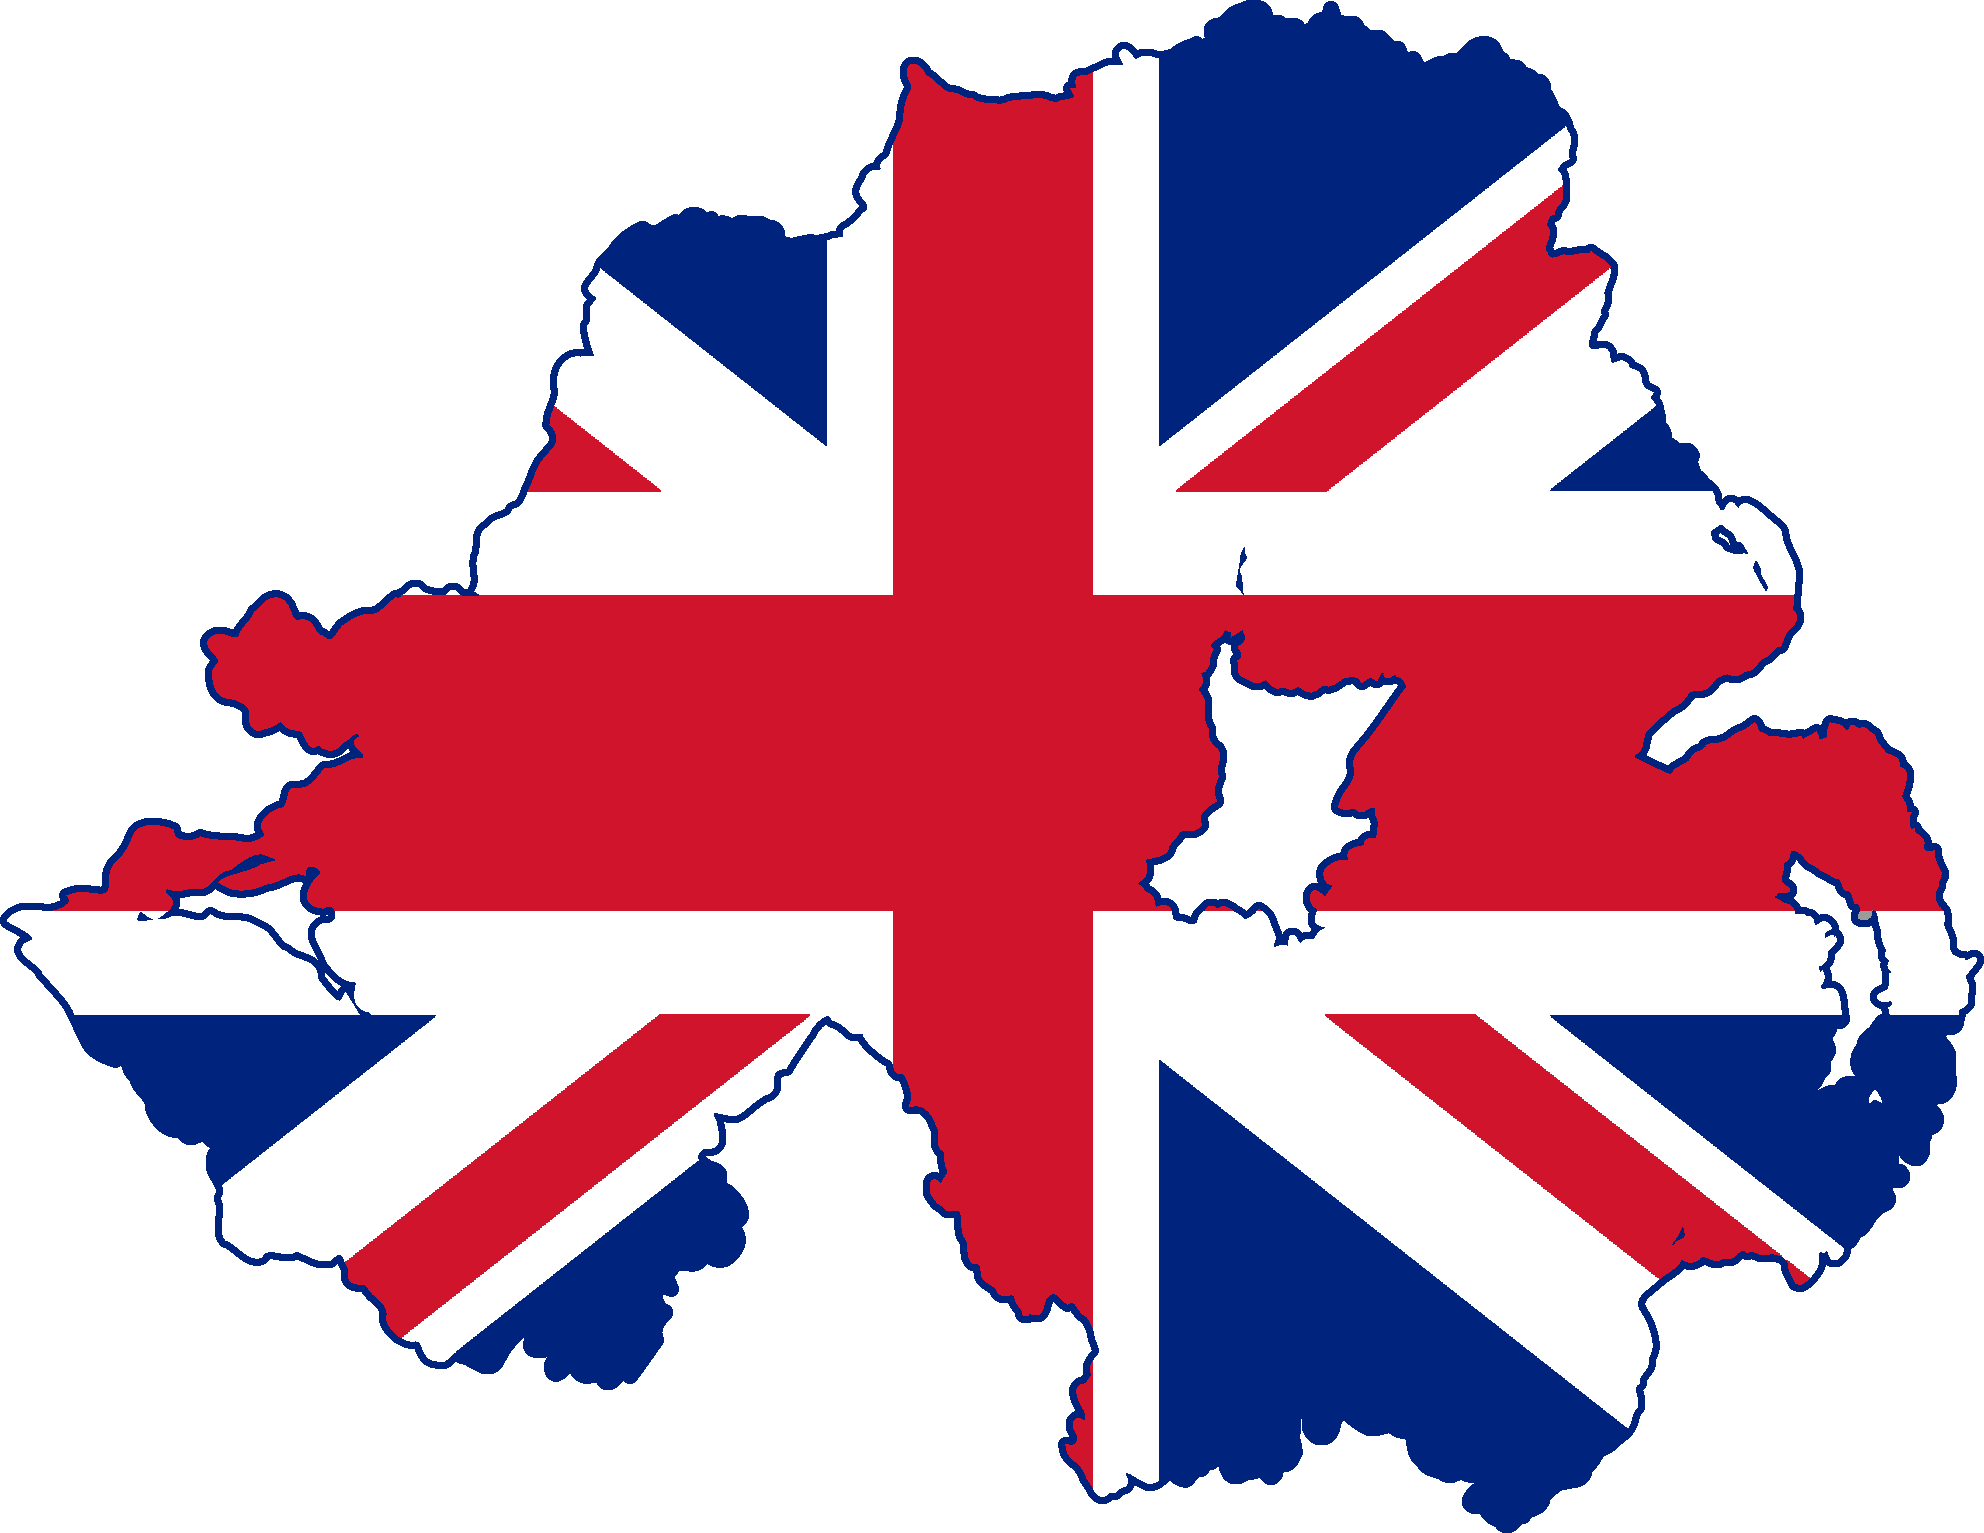 United kingdom flag clipart image transparent download United Kingdom Flag Clipart - Clipart Kid image transparent download